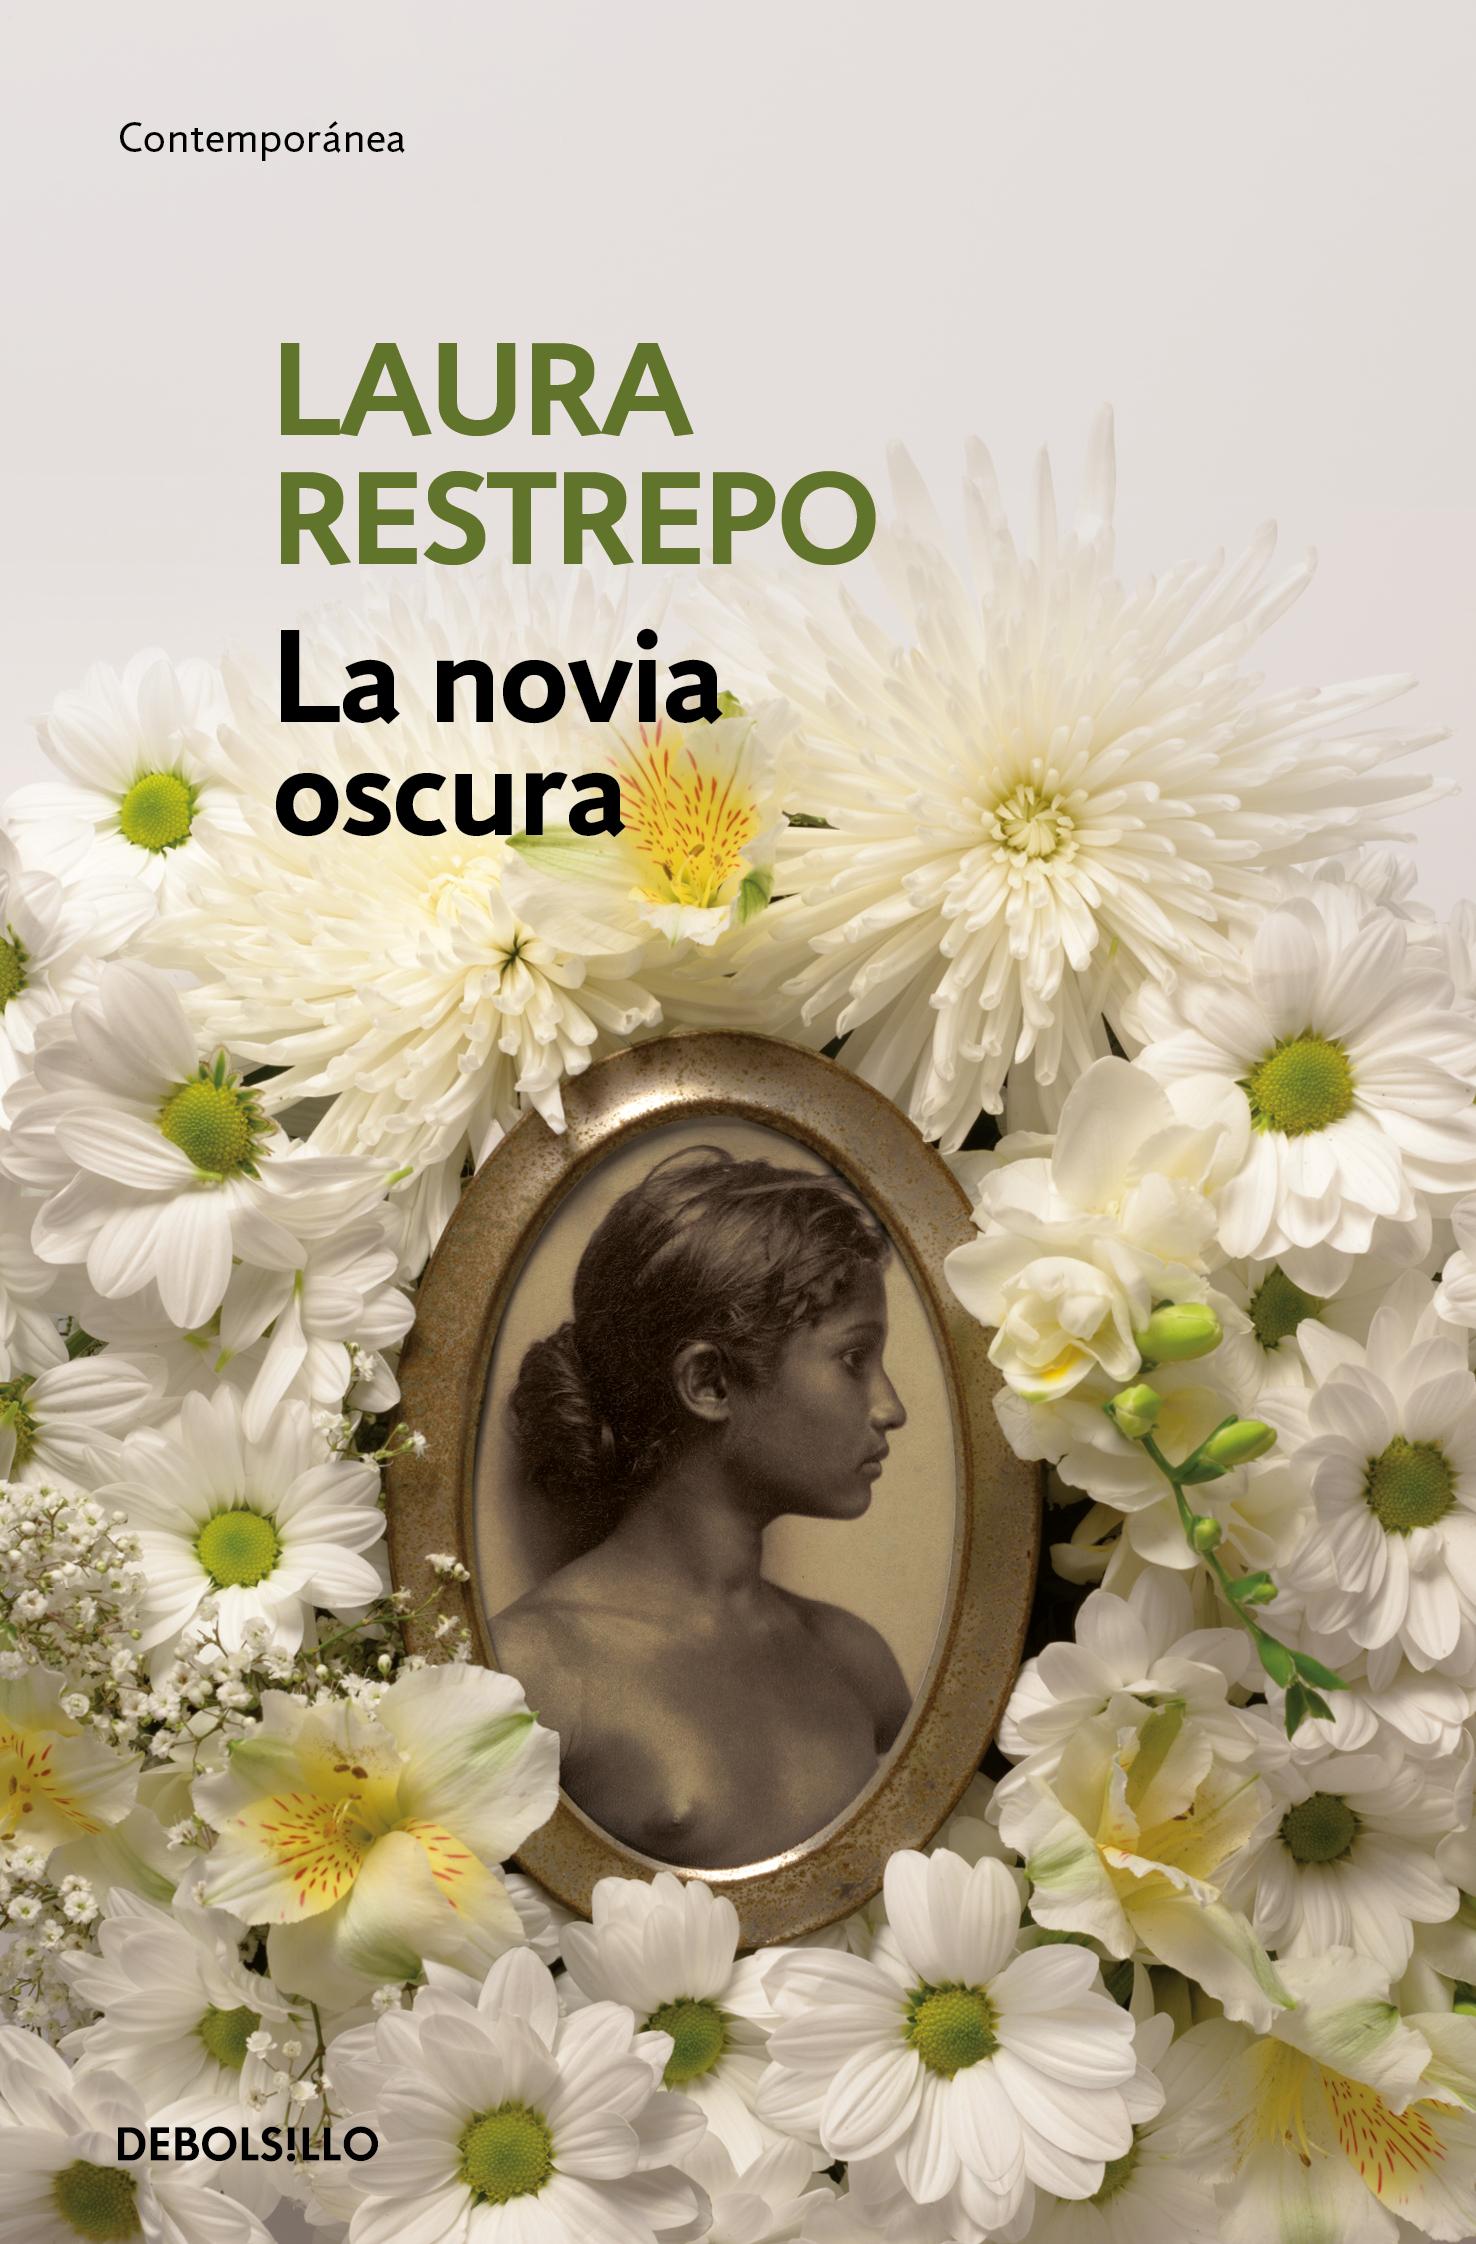 LA NOVIA OSCURA